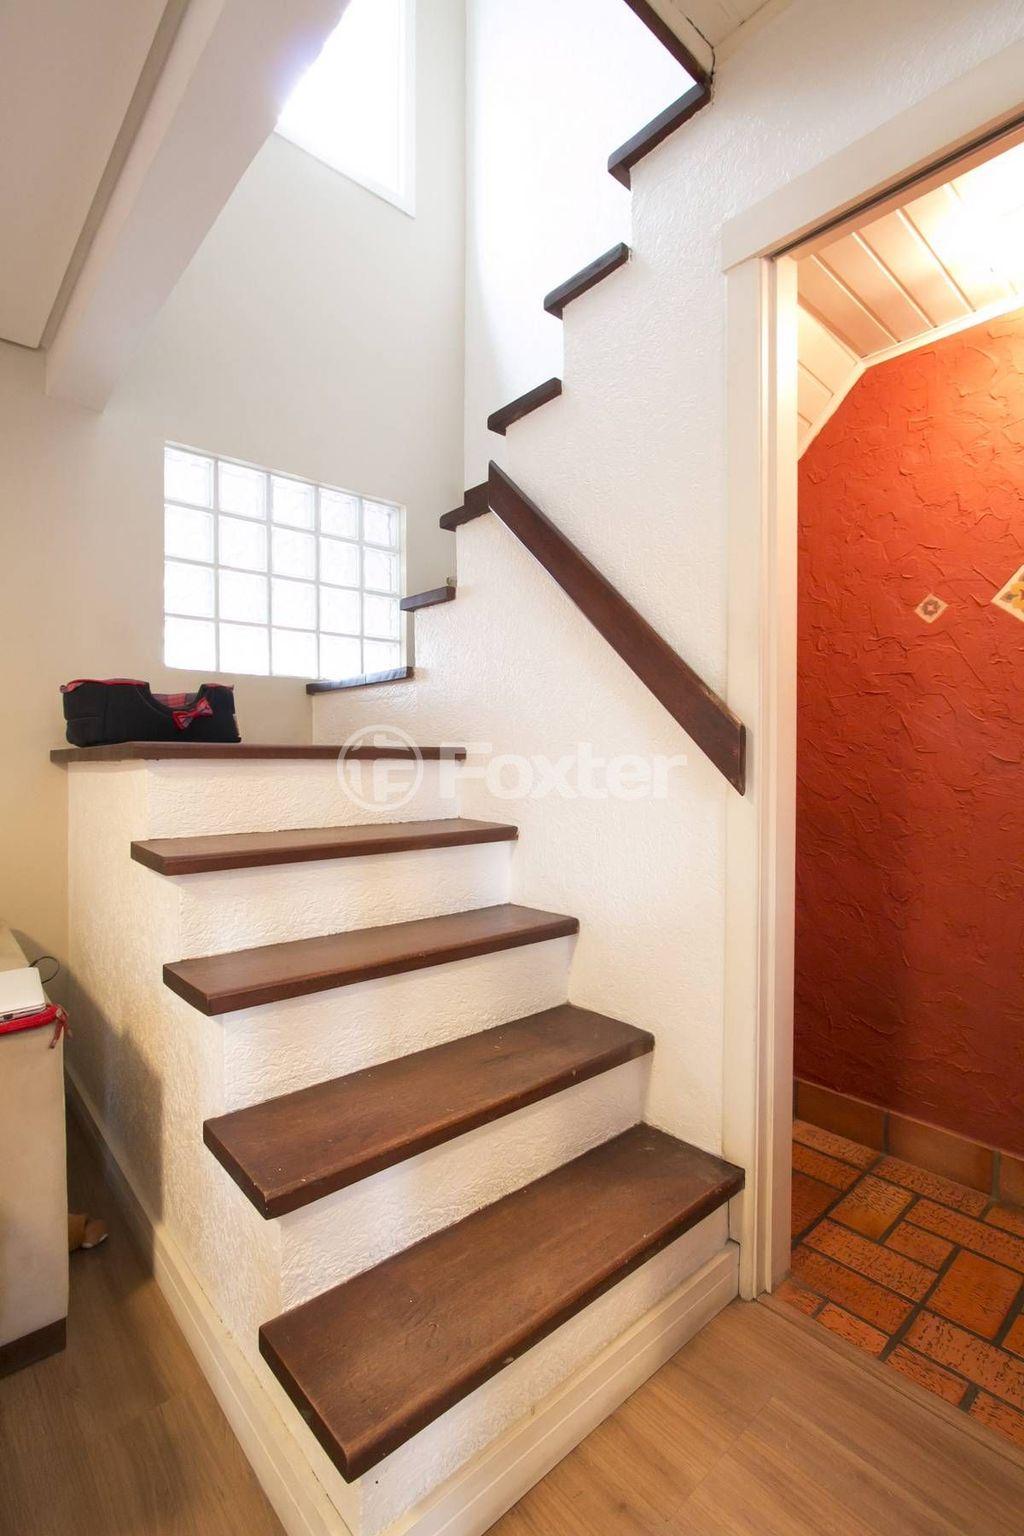 Casa 3 Dorm, Cavalhada, Porto Alegre (108390) - Foto 9